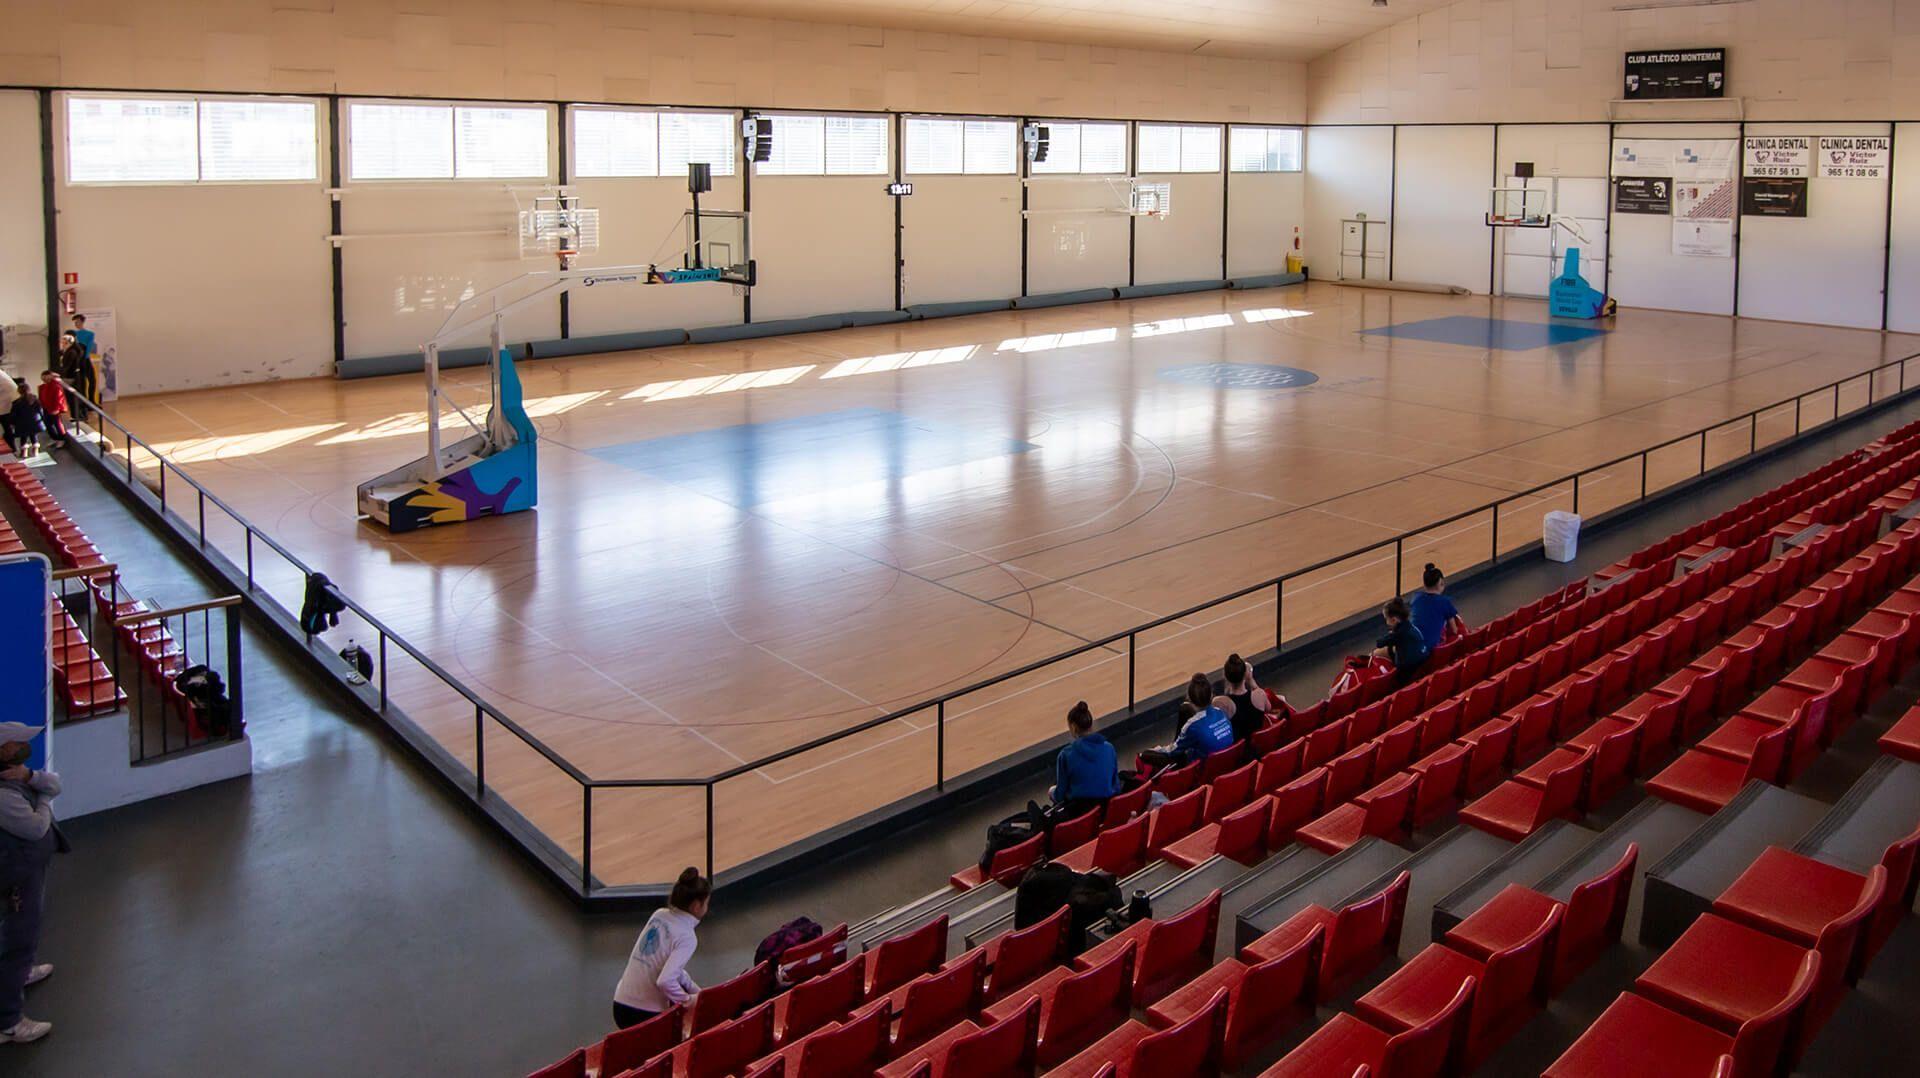 Pabellón Polideportivo Montemar Padre Esplá